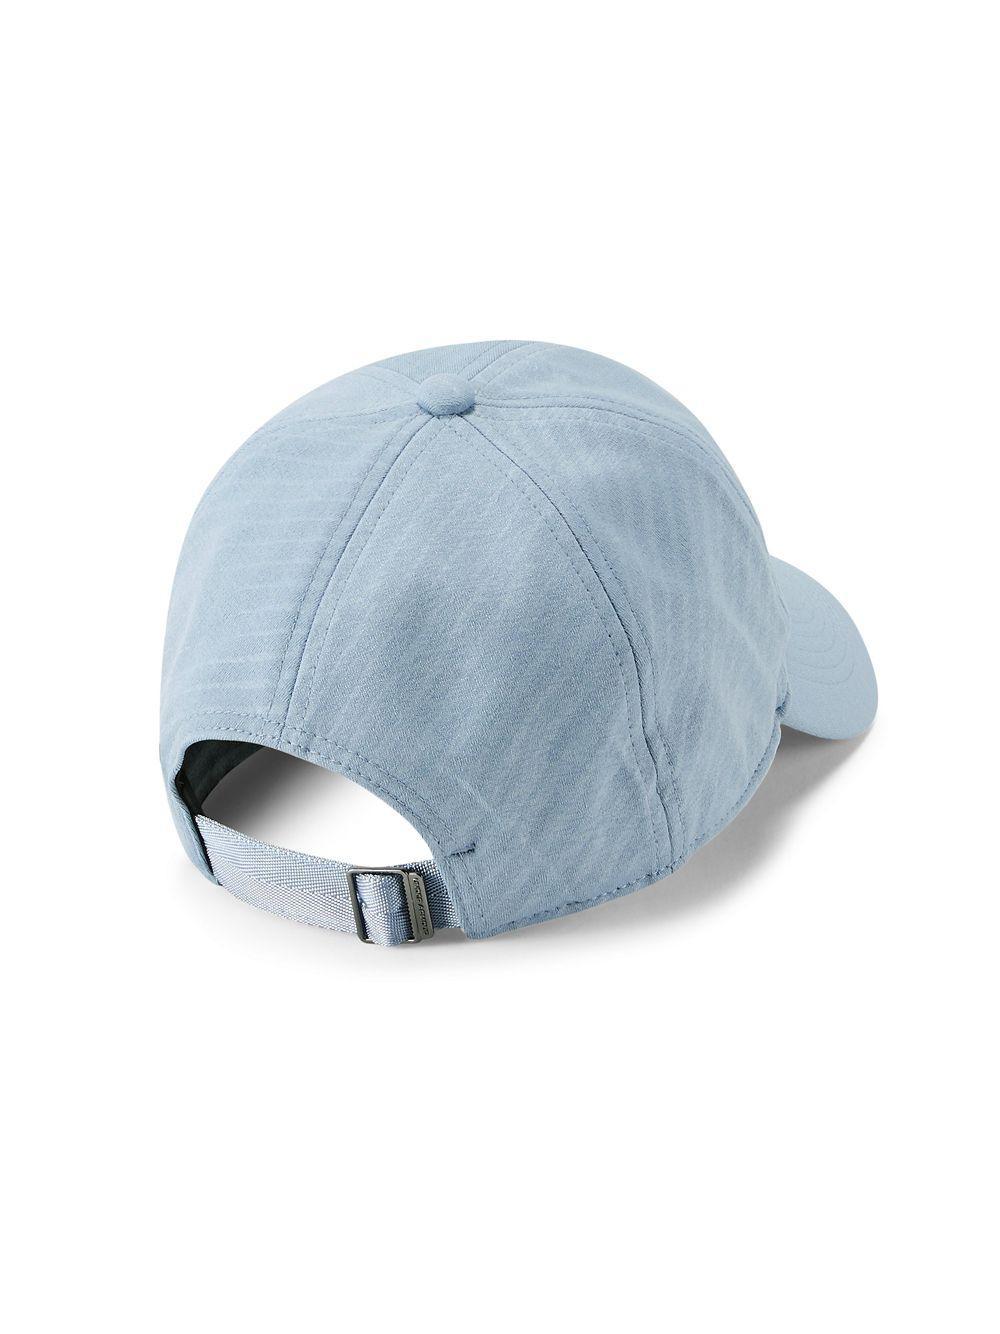 e3986475075 ... promo code for under armour blue microthread renegade printed cap lyst.  view fullscreen 8f14d 78d1c